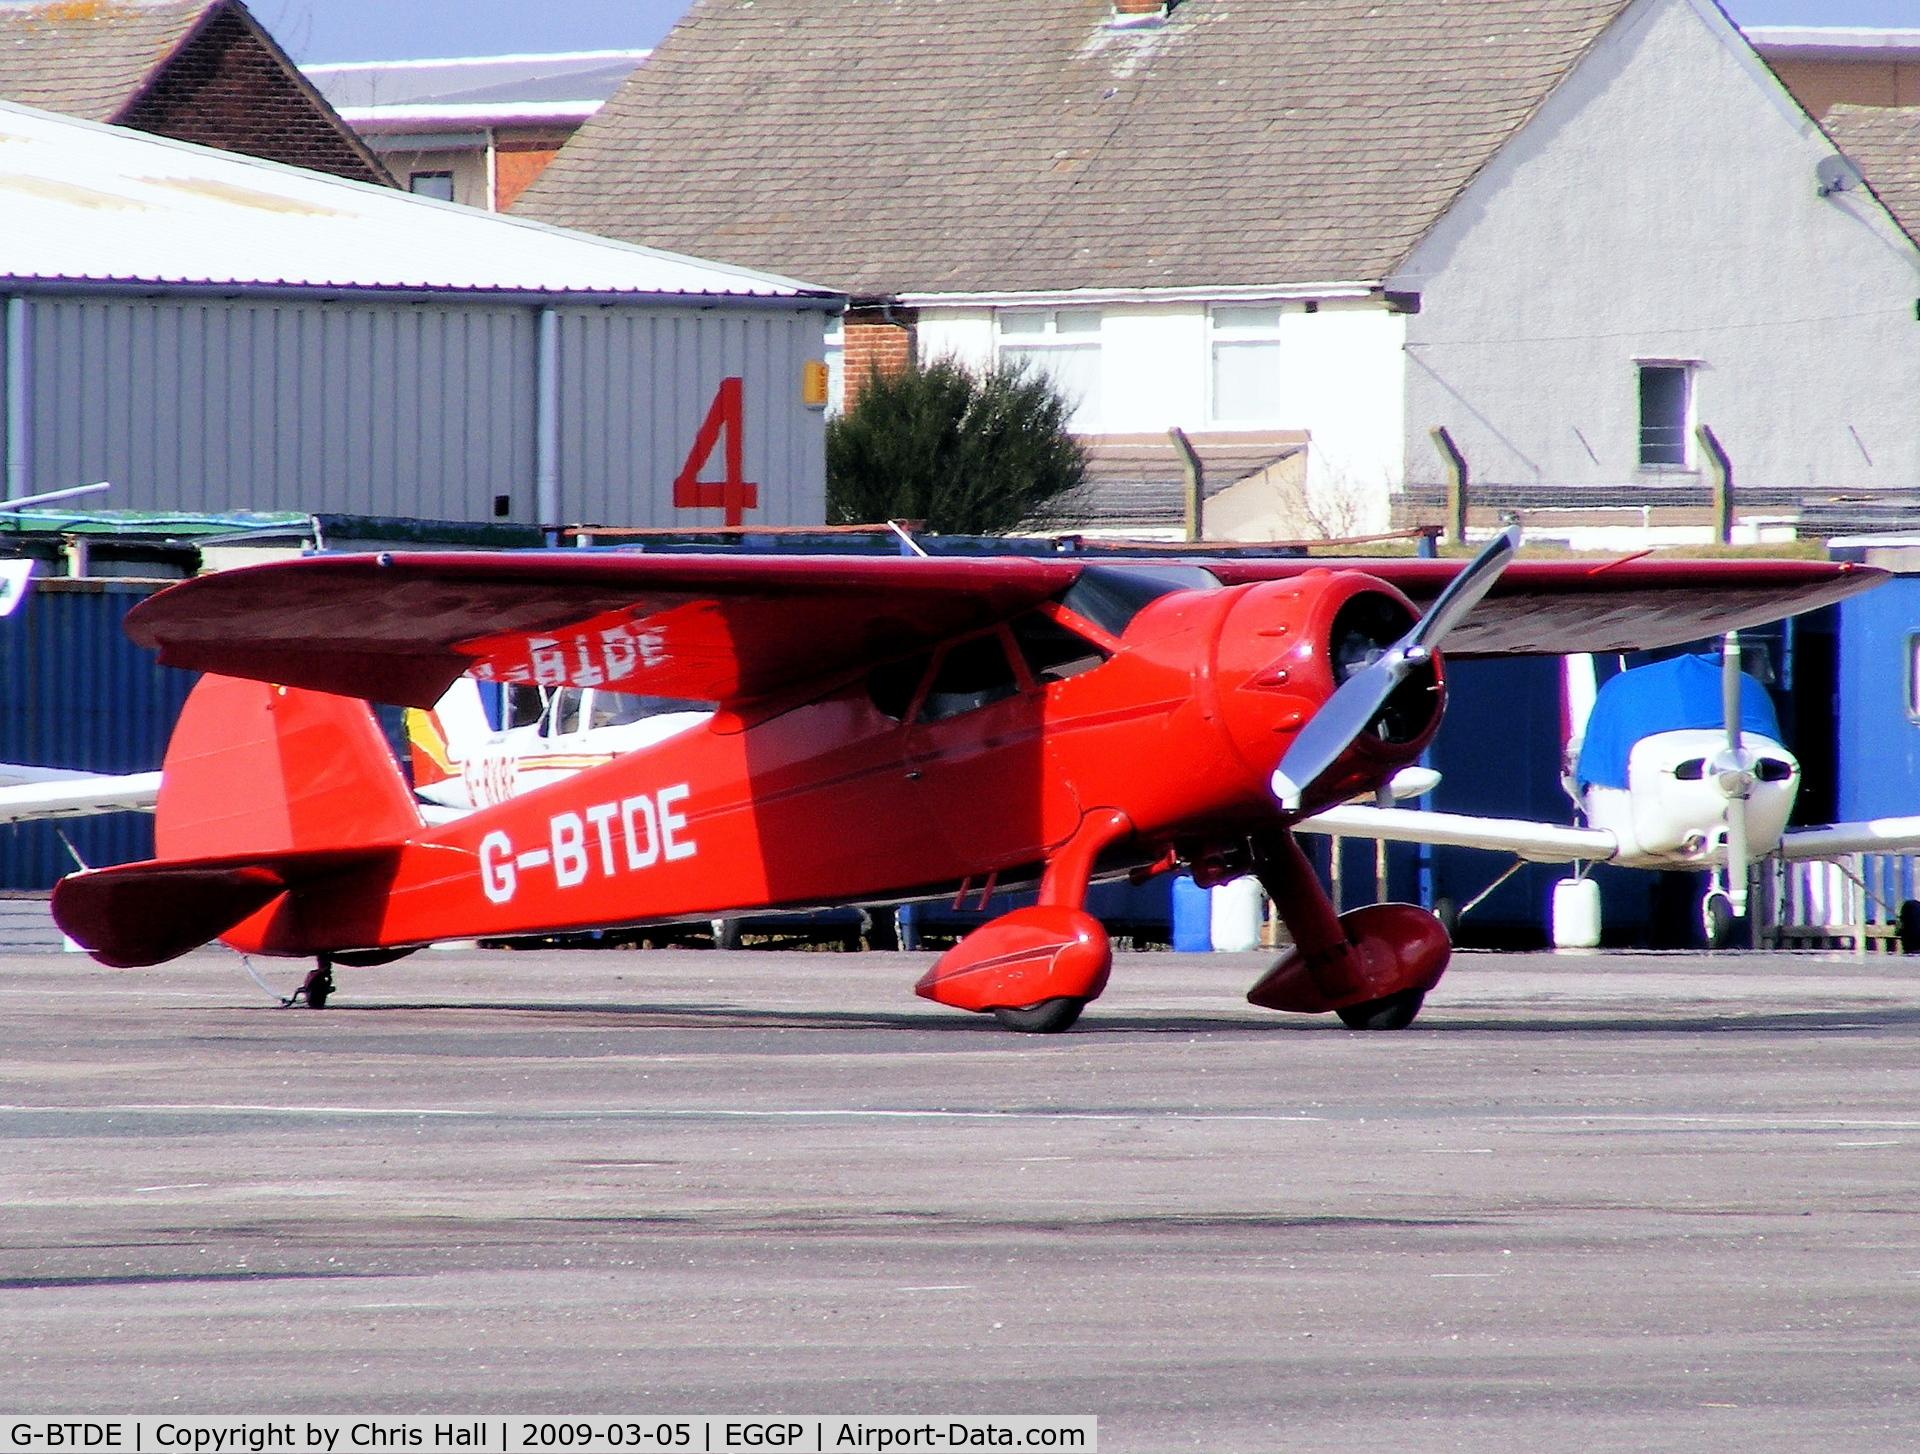 G-BTDE, 1940 Cessna C-165 Airmaster C/N 551, Previous ID: N21911